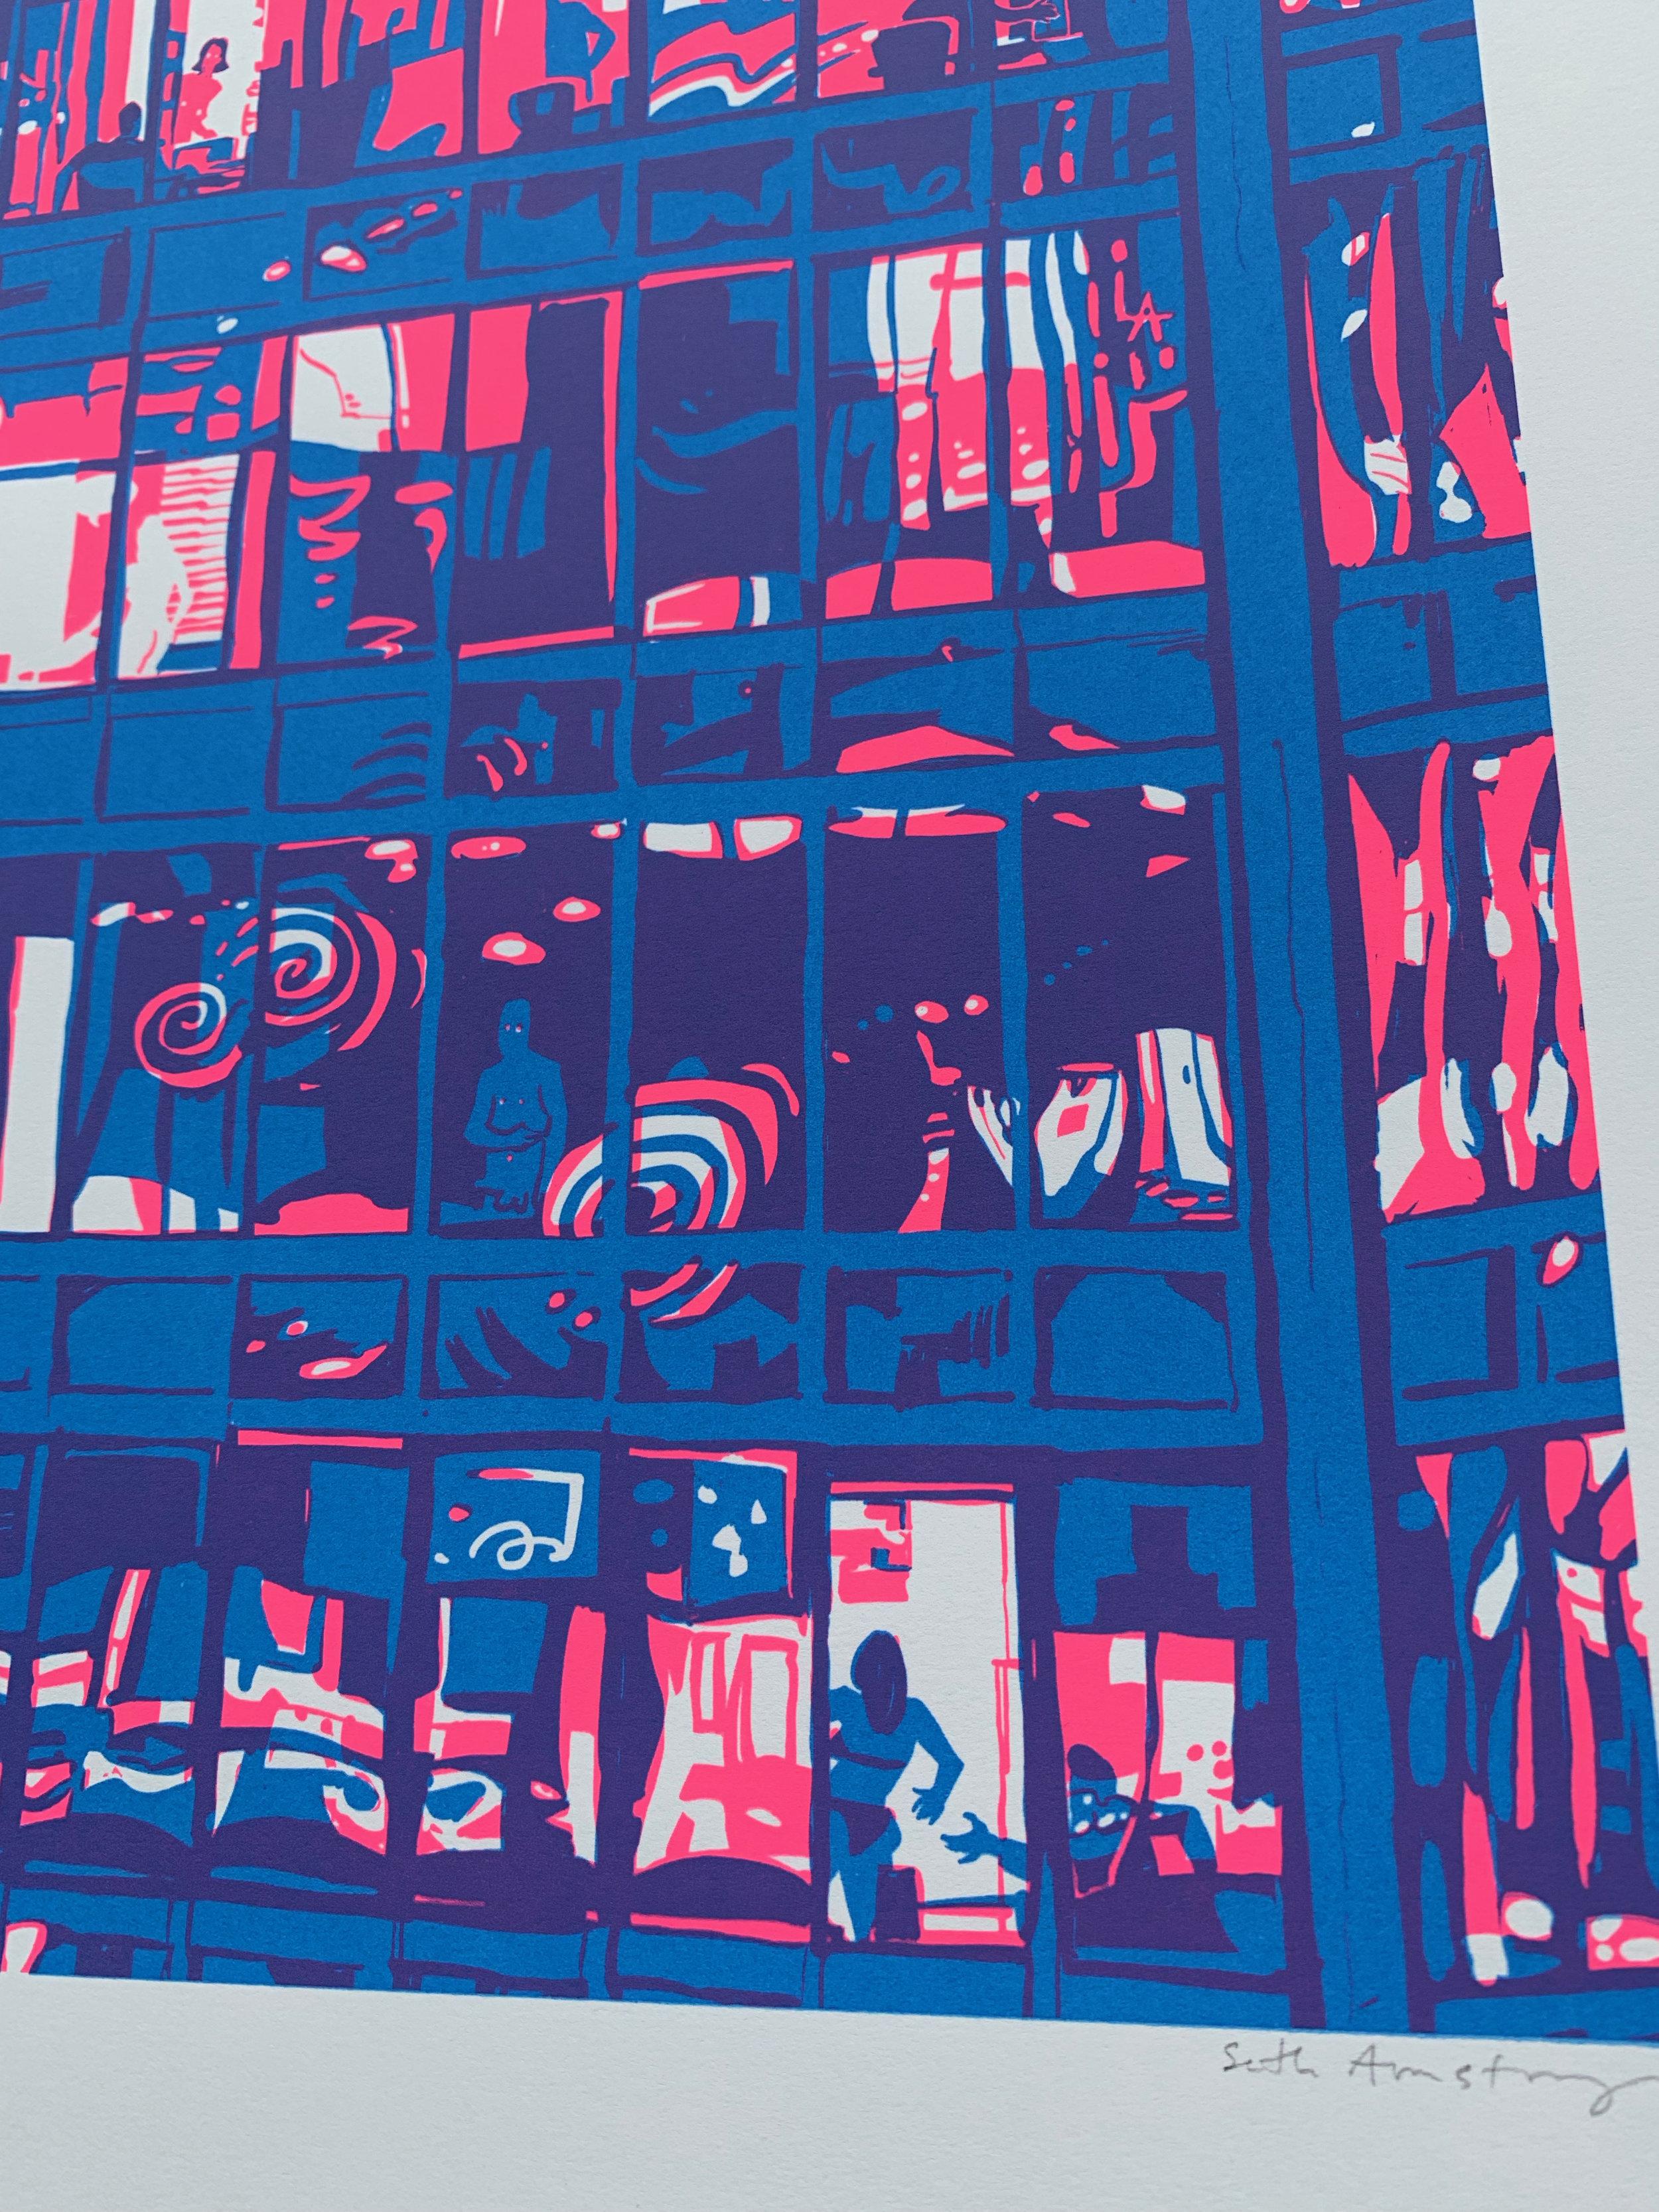 pinkandblue_dusk_detail 2.jpg